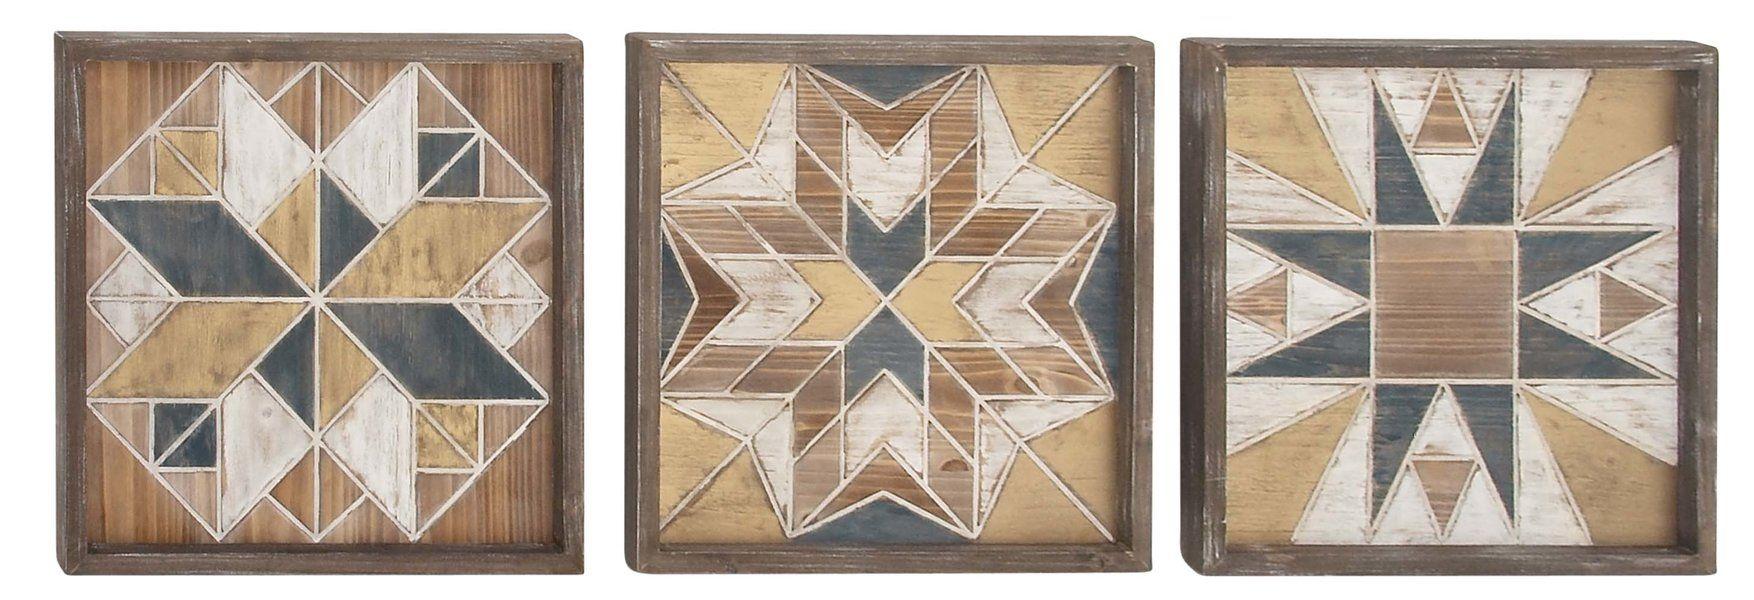 3 Piece Wood Wall Decor Set Joss Main With Images Compass